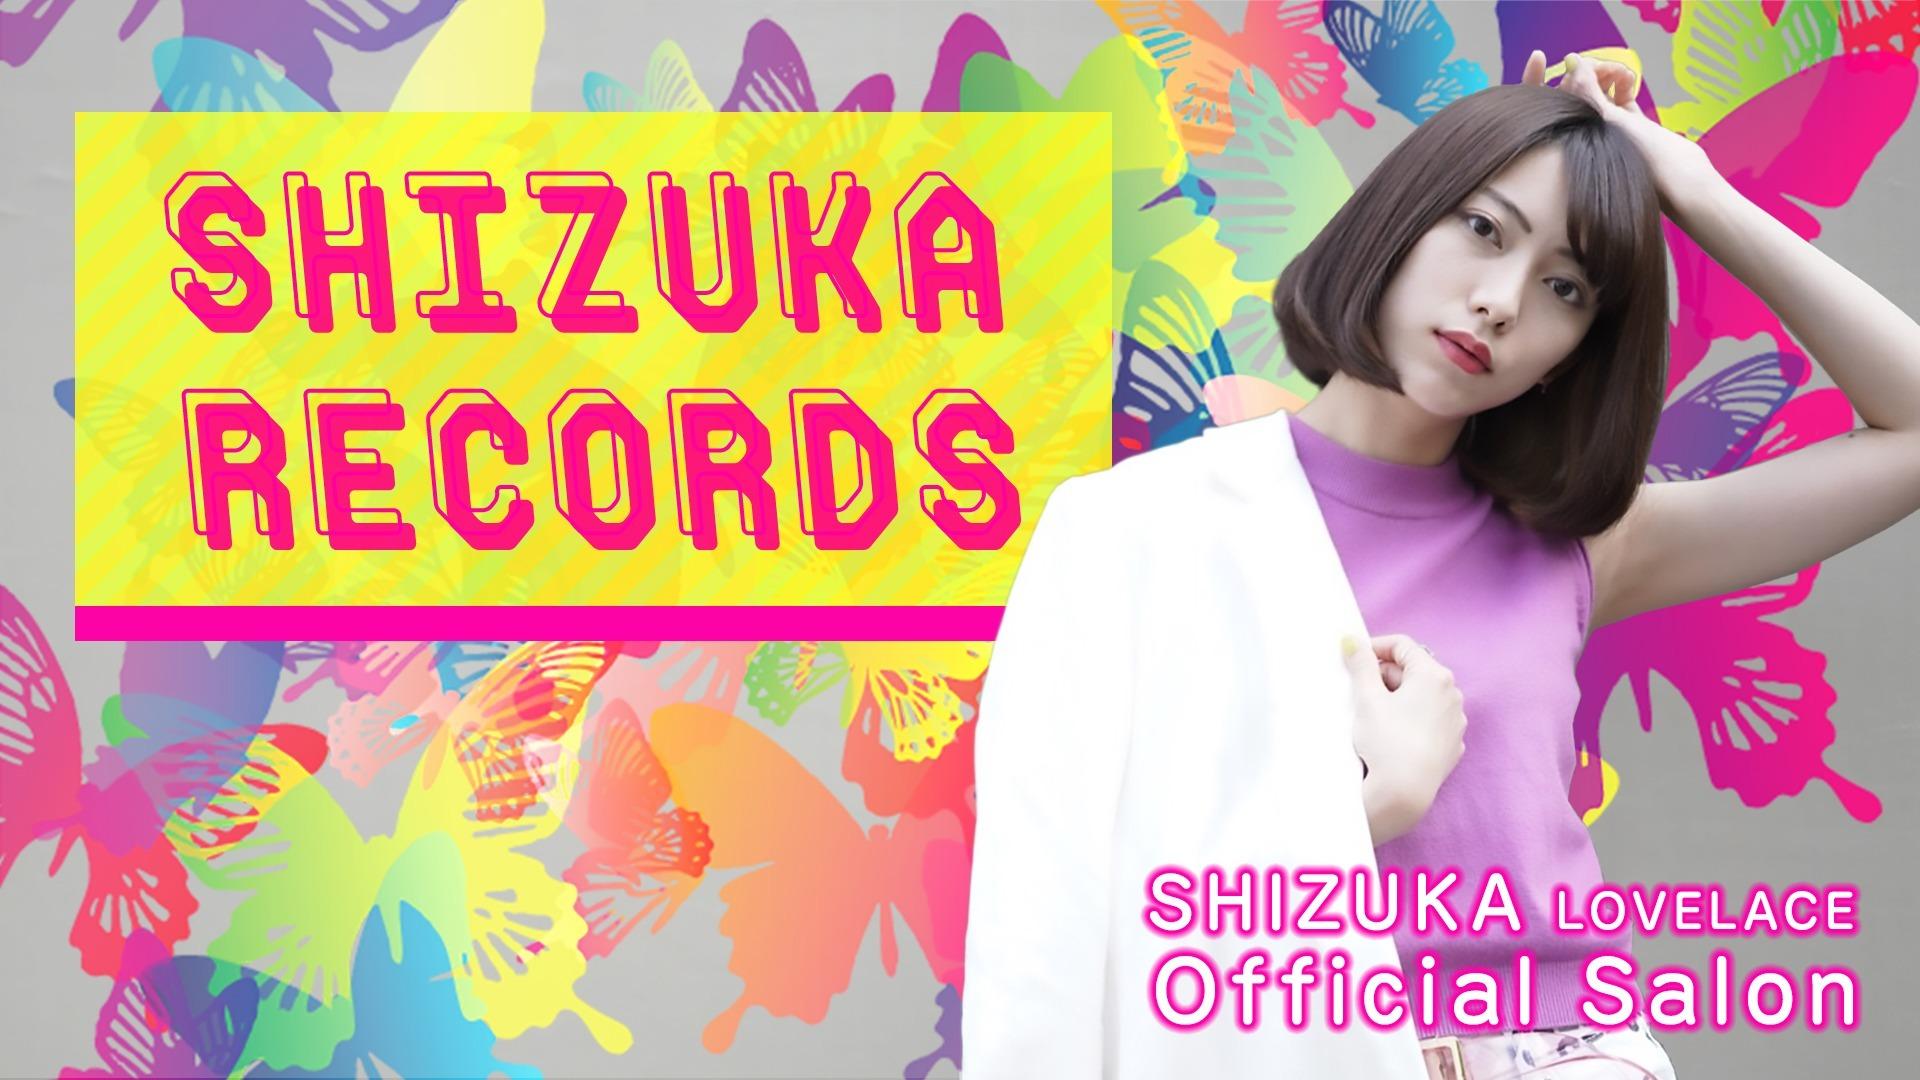 SHIZUKA RECORDS